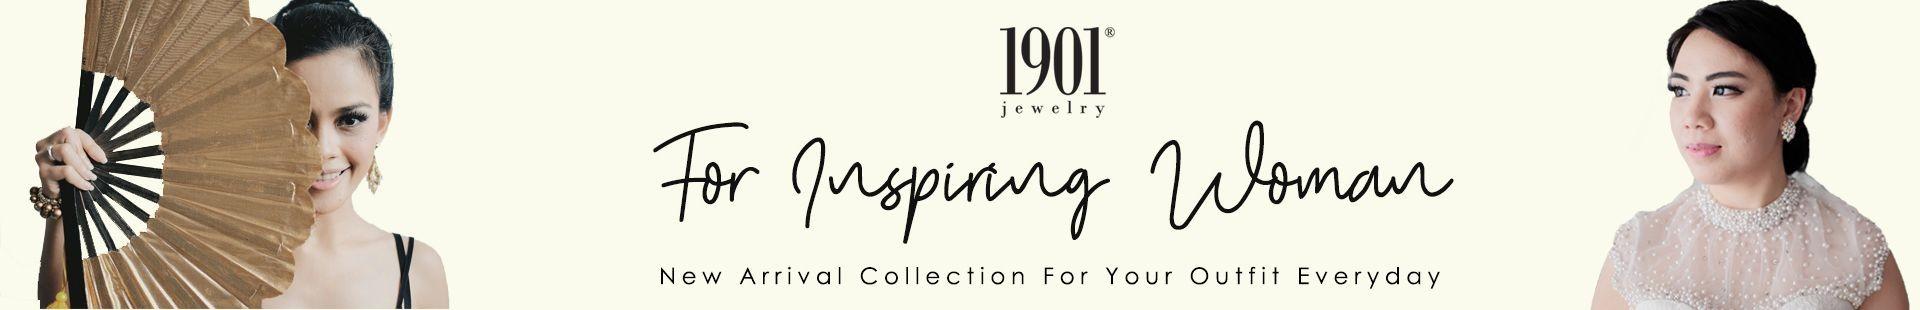 1901 Jewelry